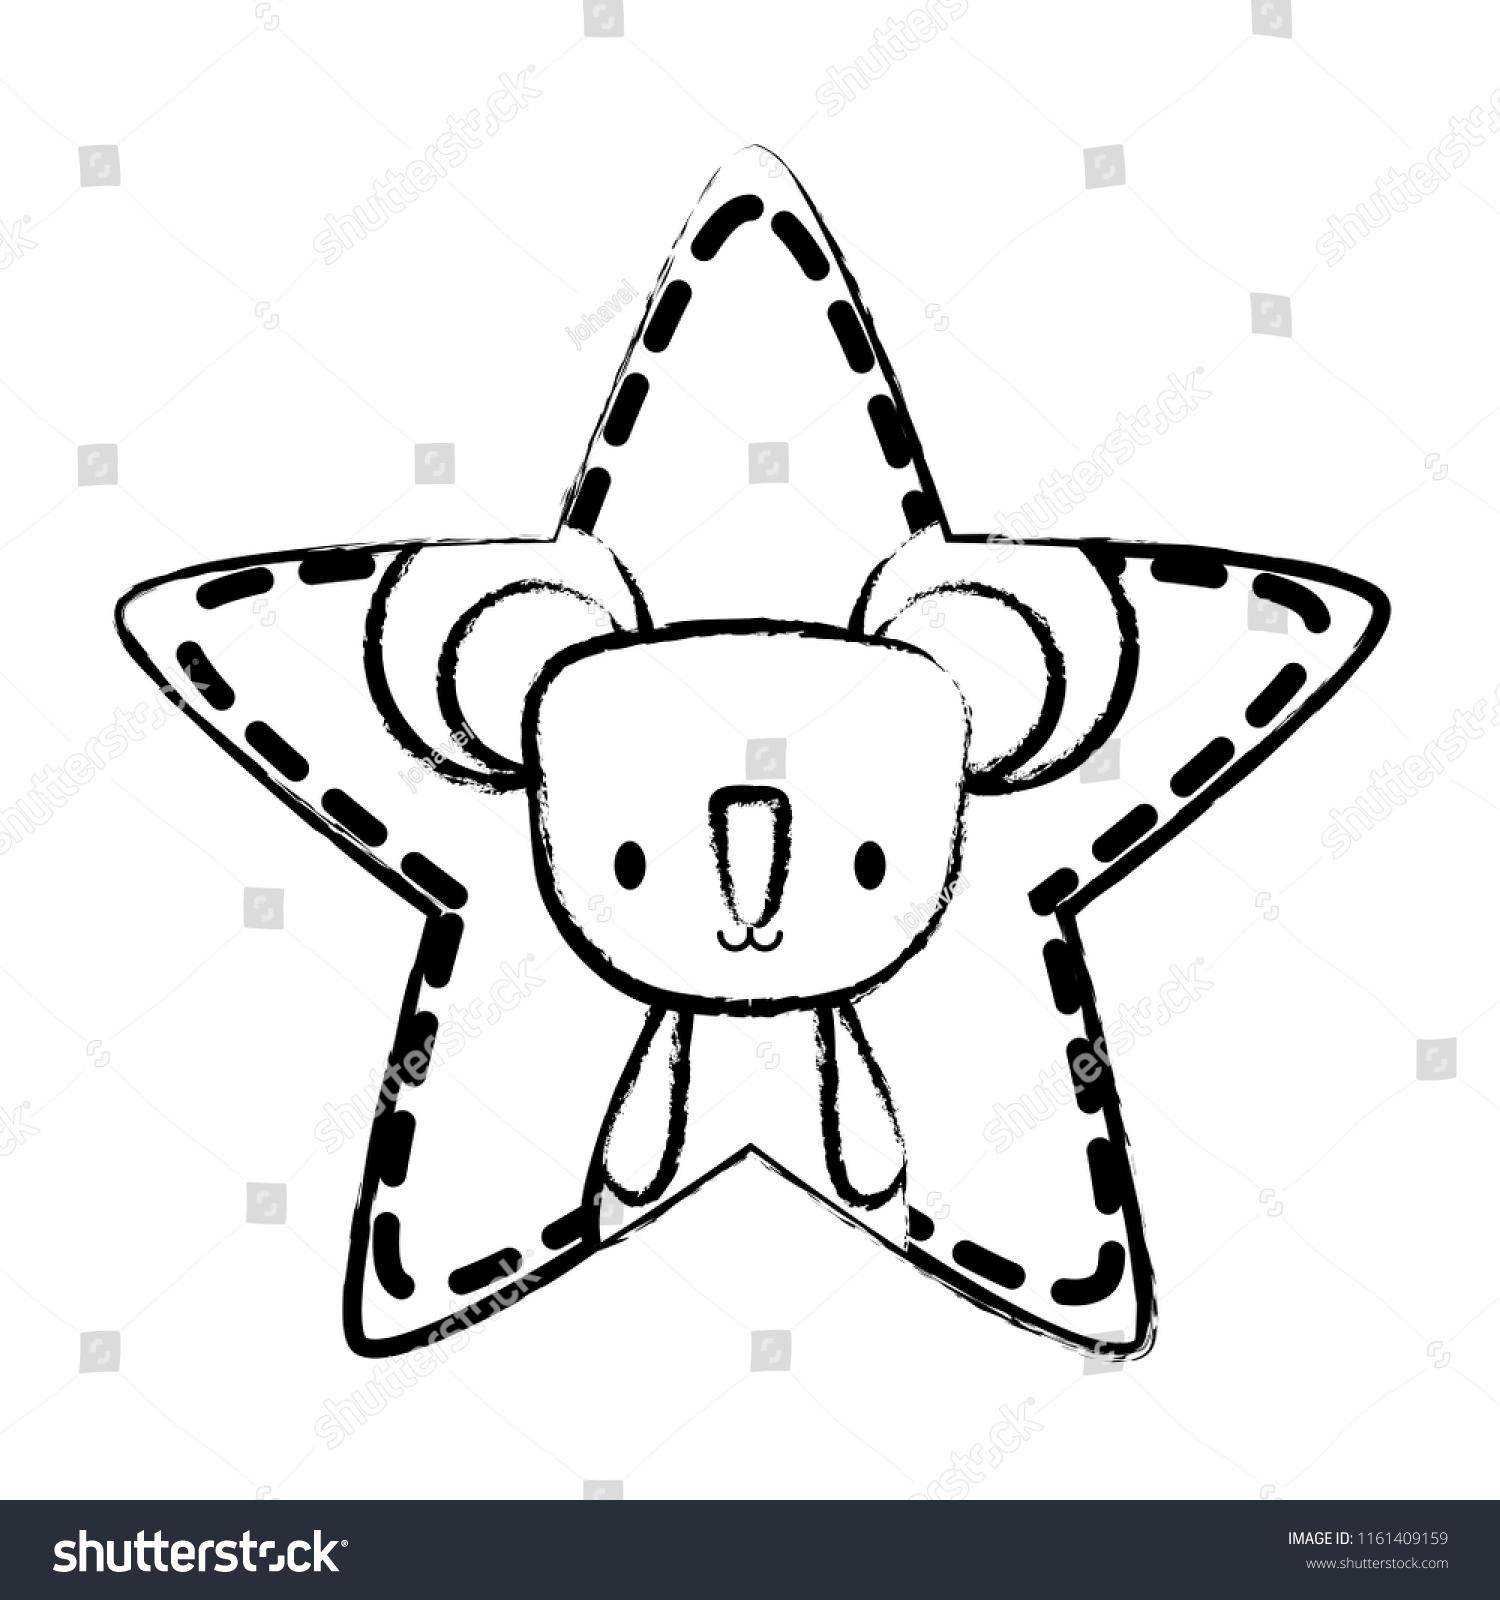 cute animals design stock vector royalty free 1161409159 California ID Card cute animals design